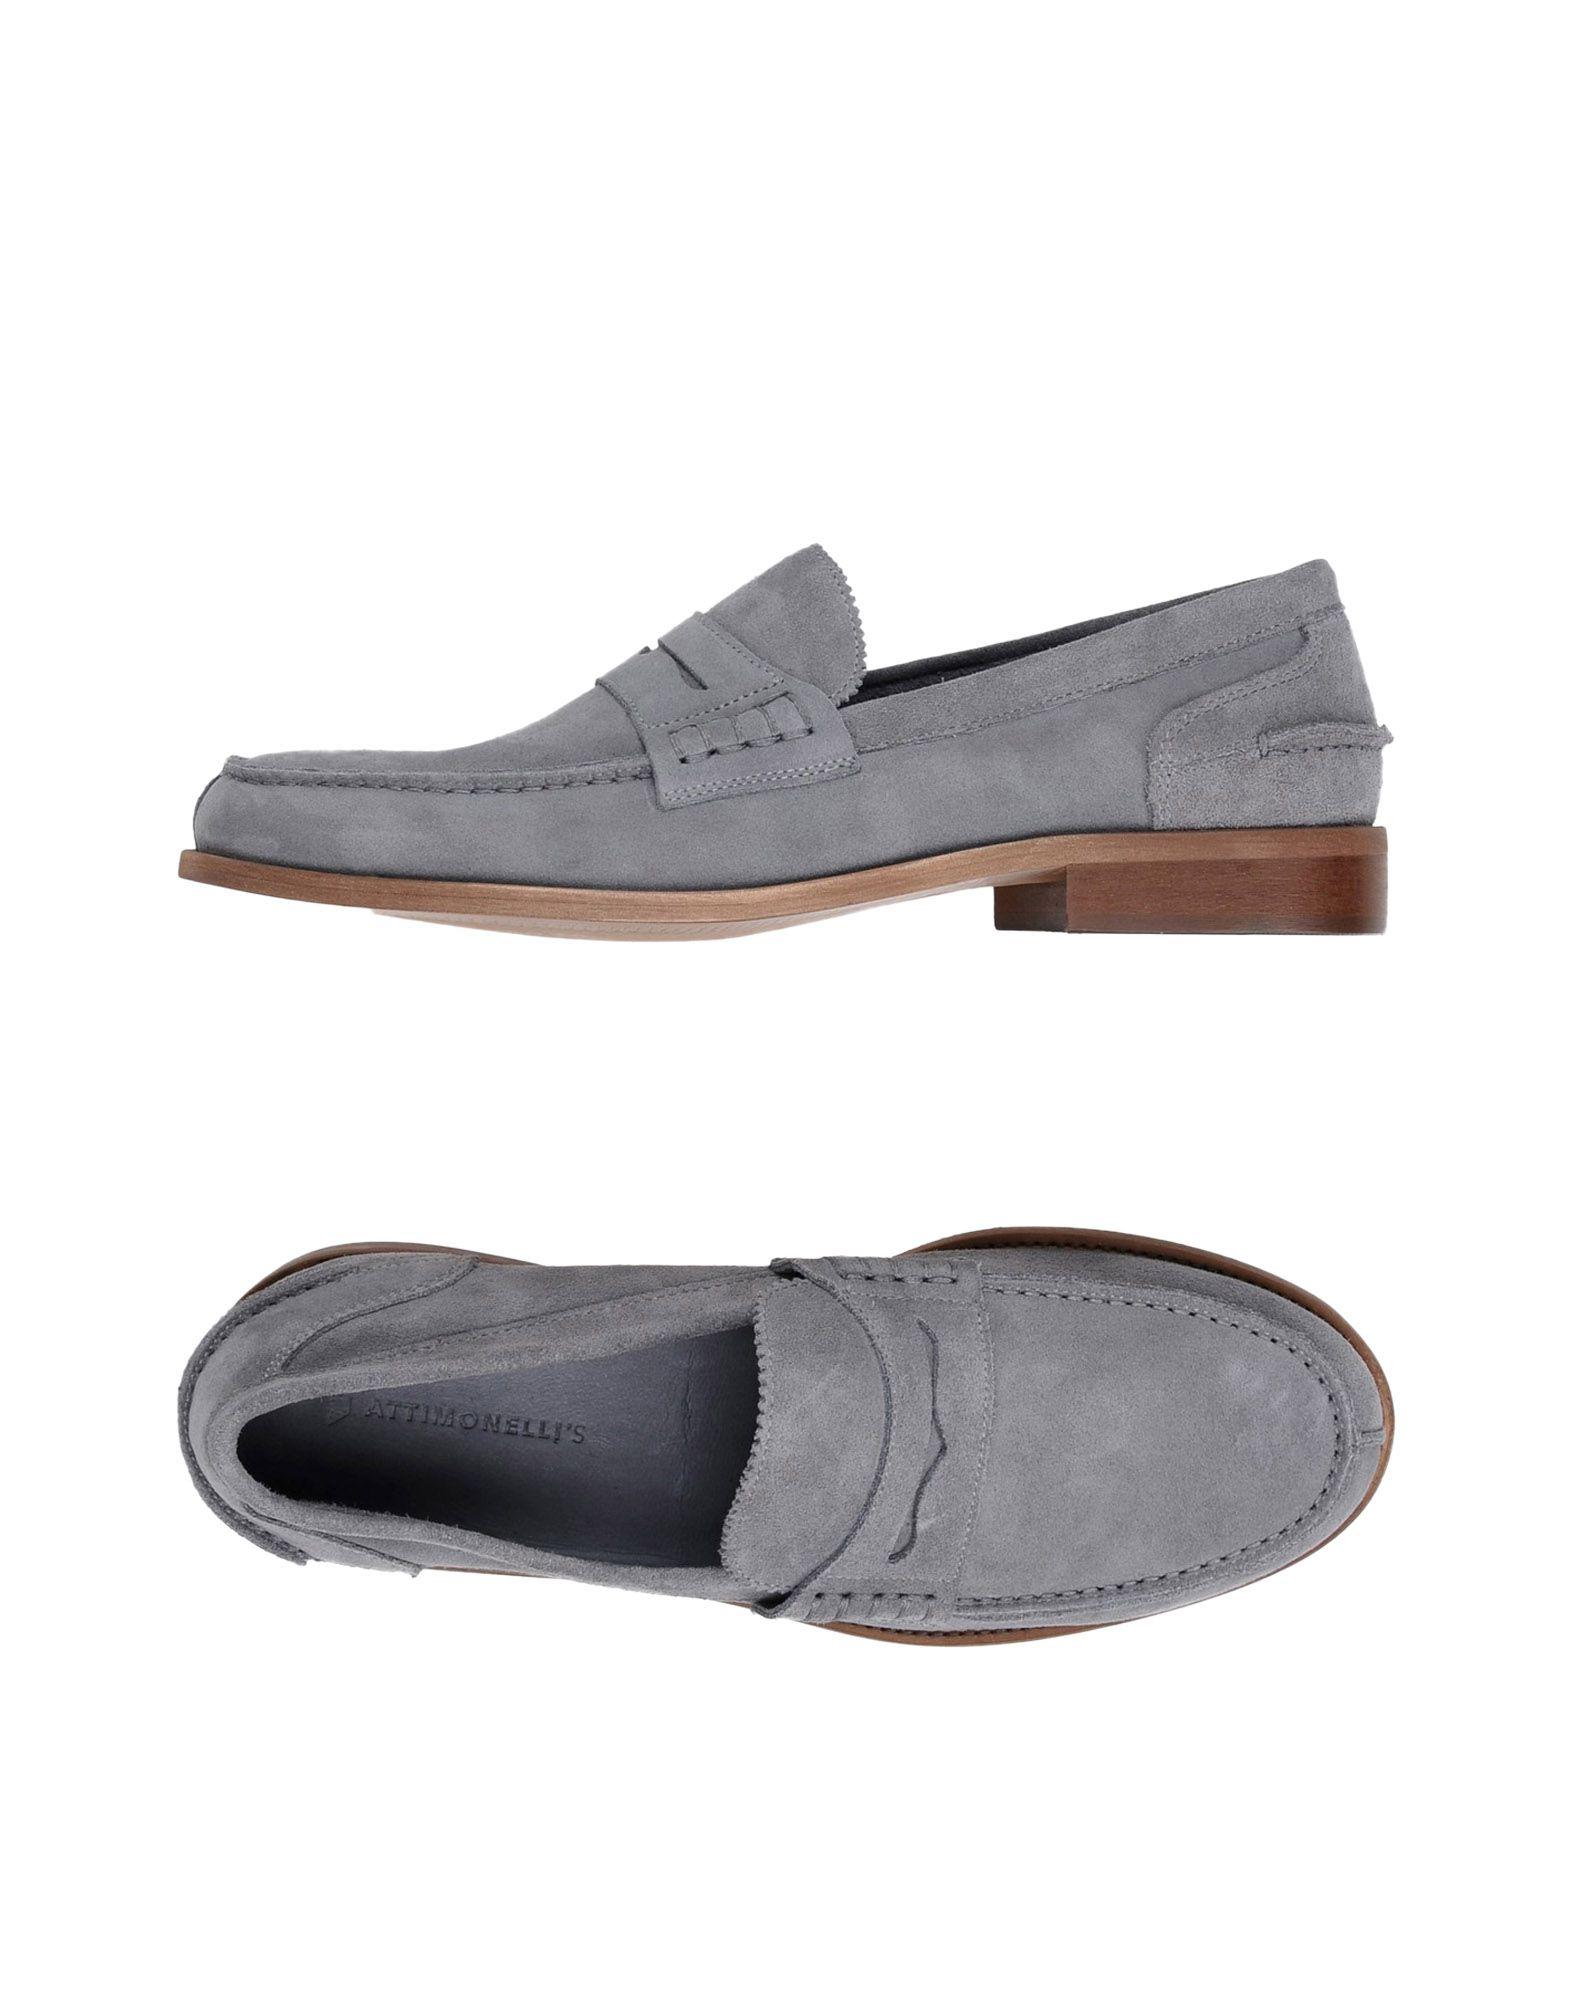 Rabatt echte Schuhe Attimonelli's Mokassins Herren  11270920BM